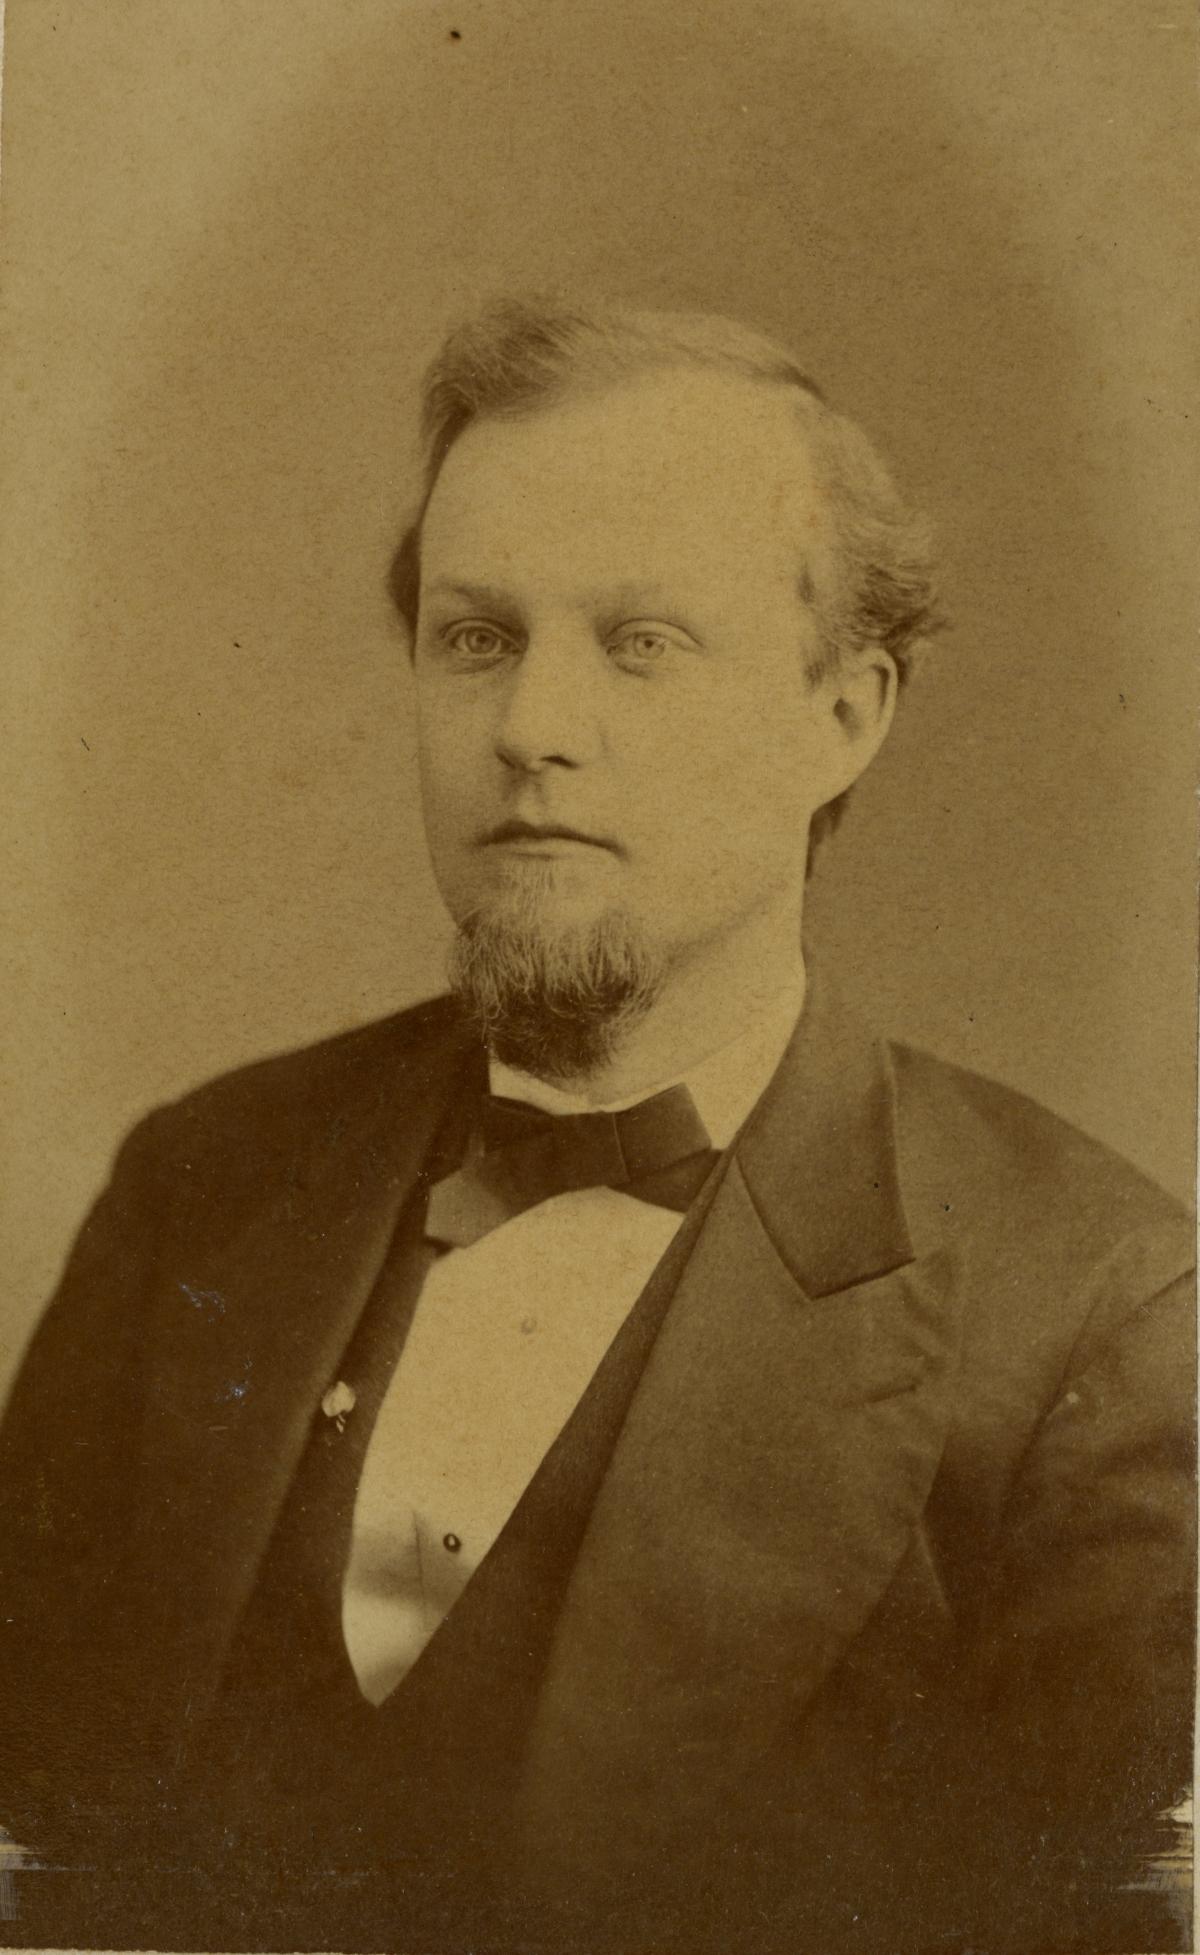 Portrait of Pomona Park pioneer C.A. Knowlton.